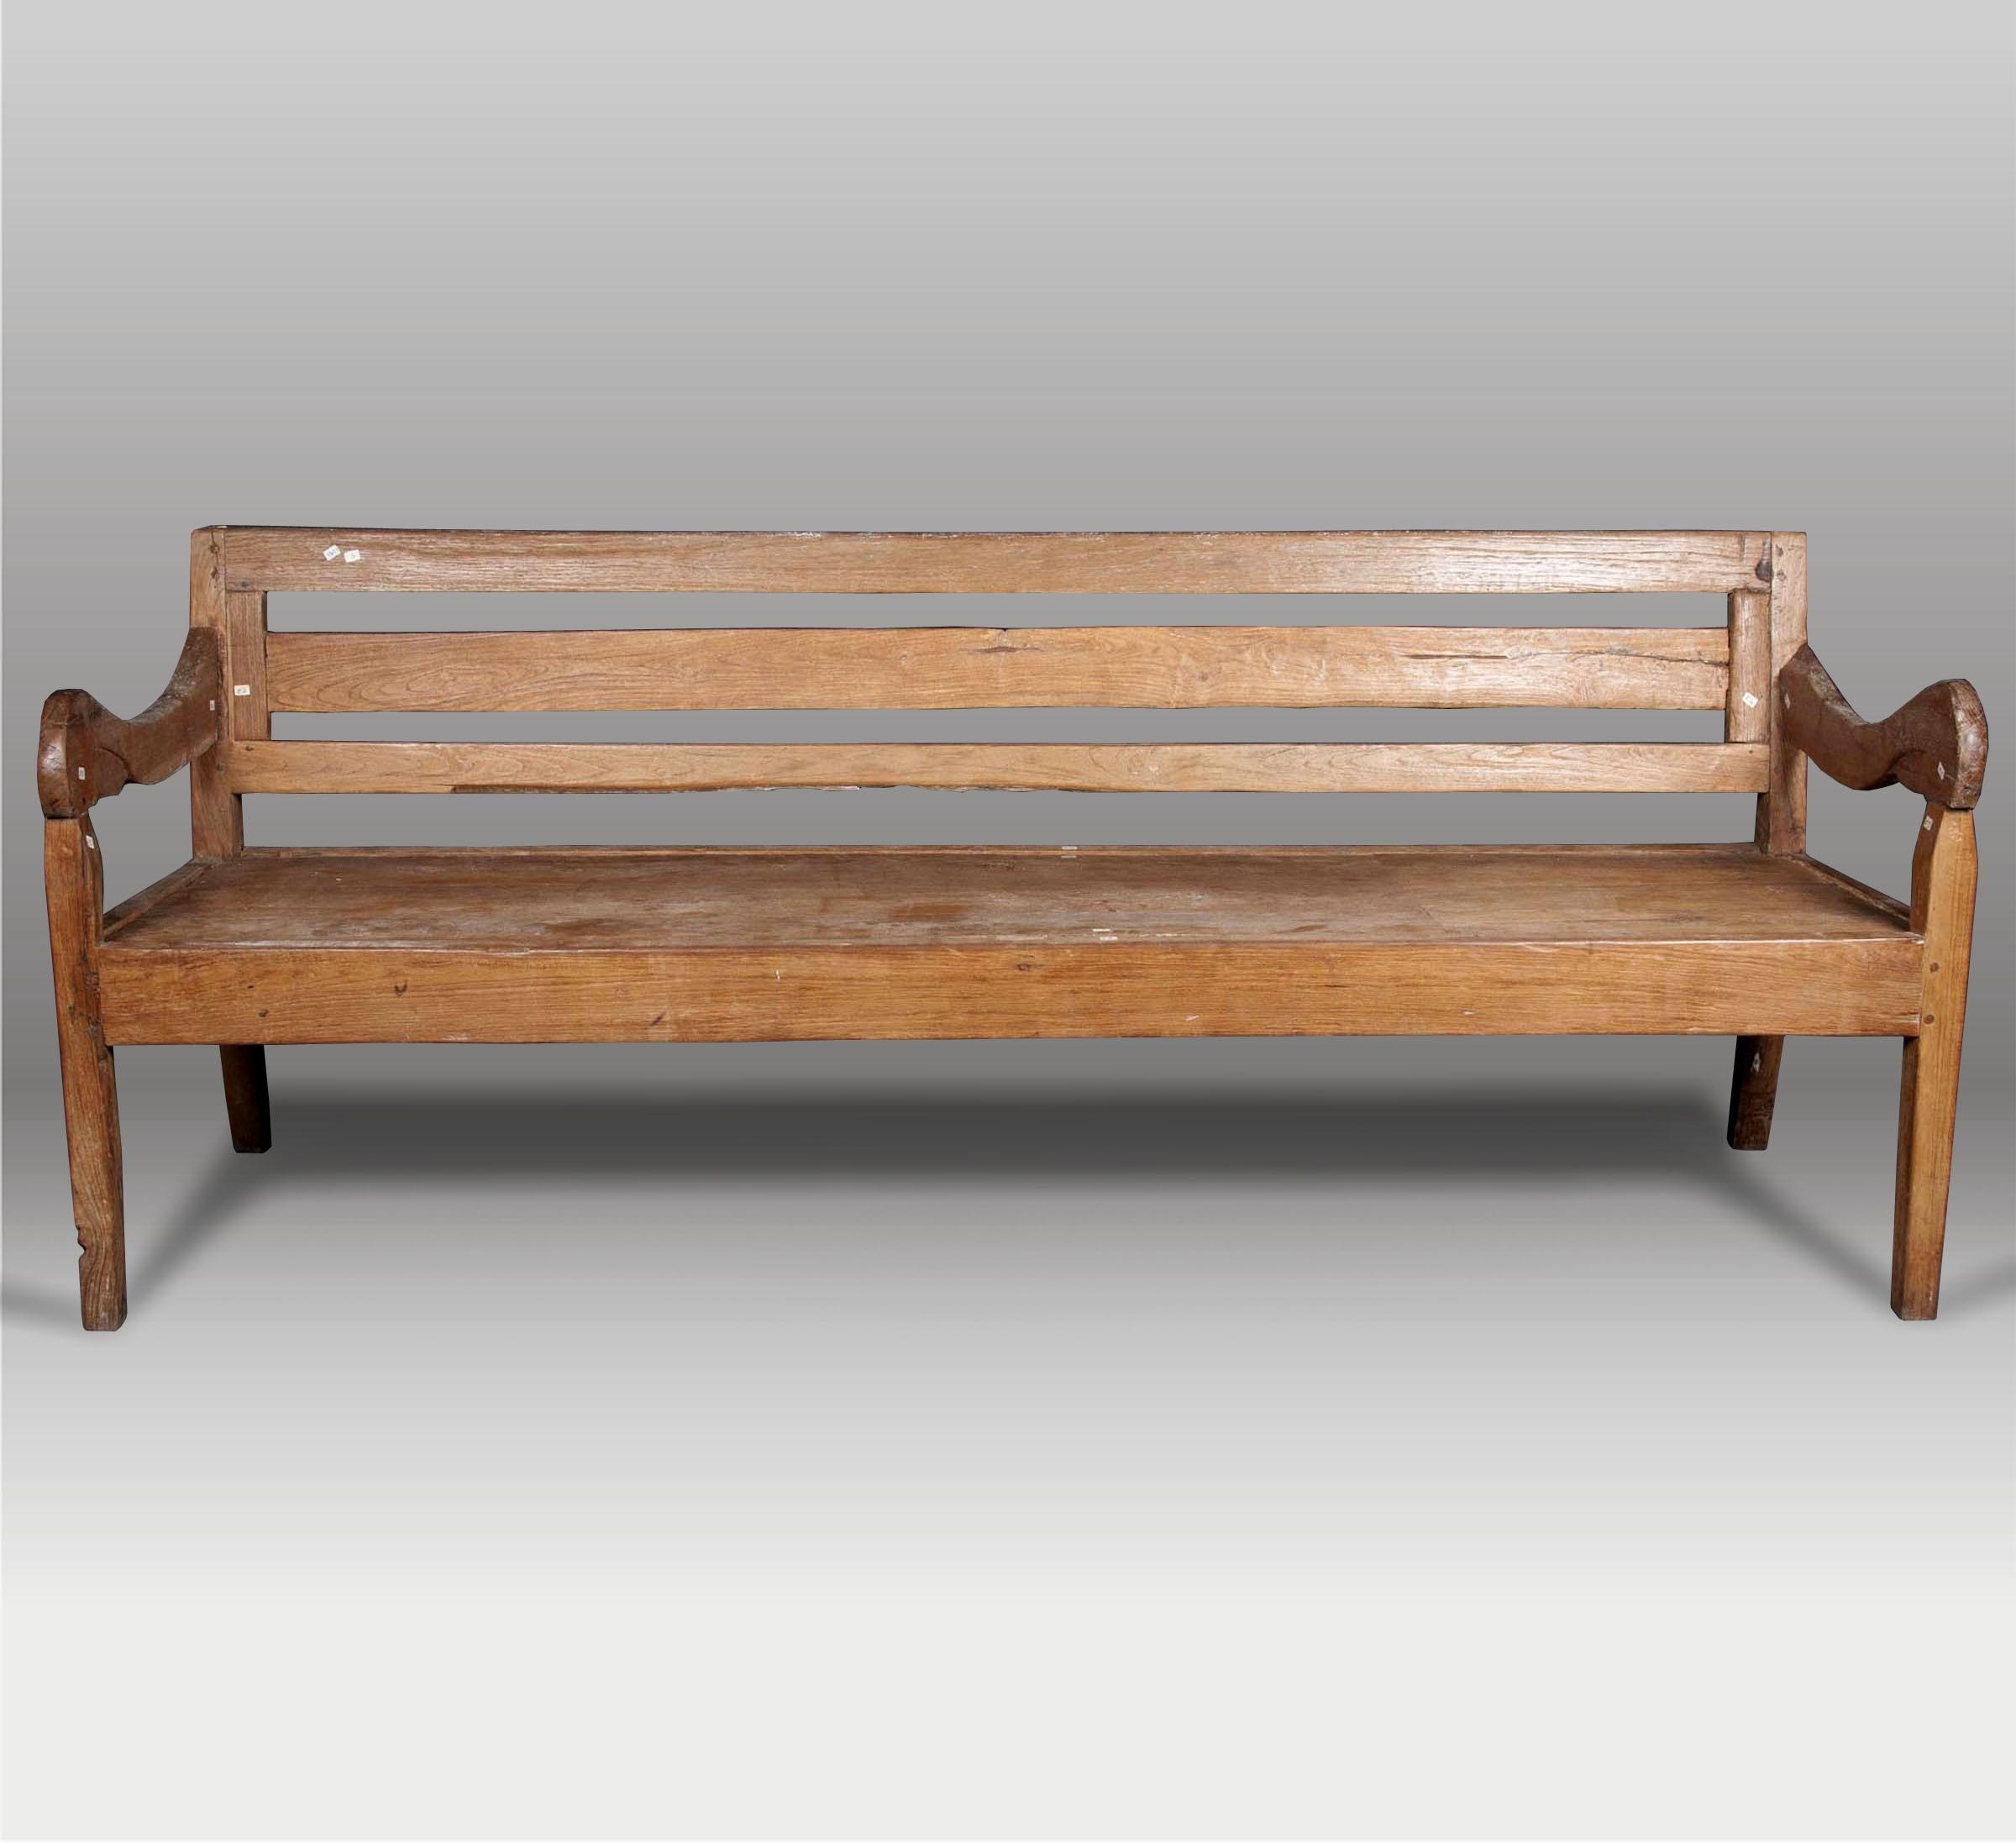 Bancos de madera para interior banco de madera baja la - Bancos de madera para interior ...